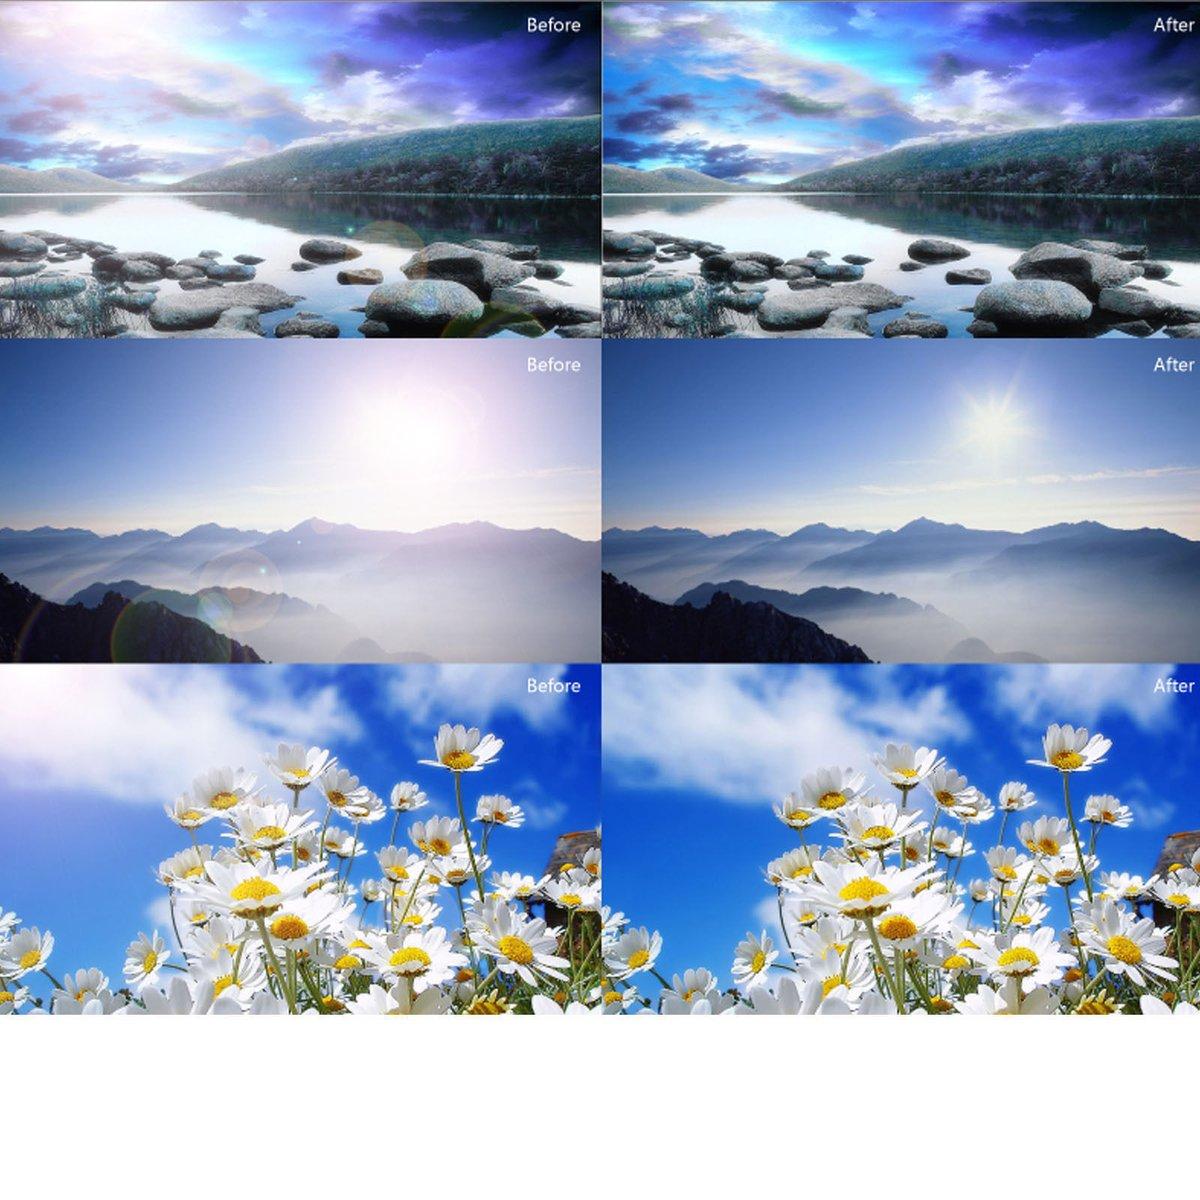 #photography  #digitalcamera #canon #eos #canoneos #lens #camera #cameraspares #nikon #dslr #photographer #sony Lens Hoods Various Canon Nikon Compatible #Canon #Nikon #Sony #Pentax Nikon HB45  HB45 II  Petal http://ukwildlife.net/photography/index.htm…pic.twitter.com/XyMKvonhvQ